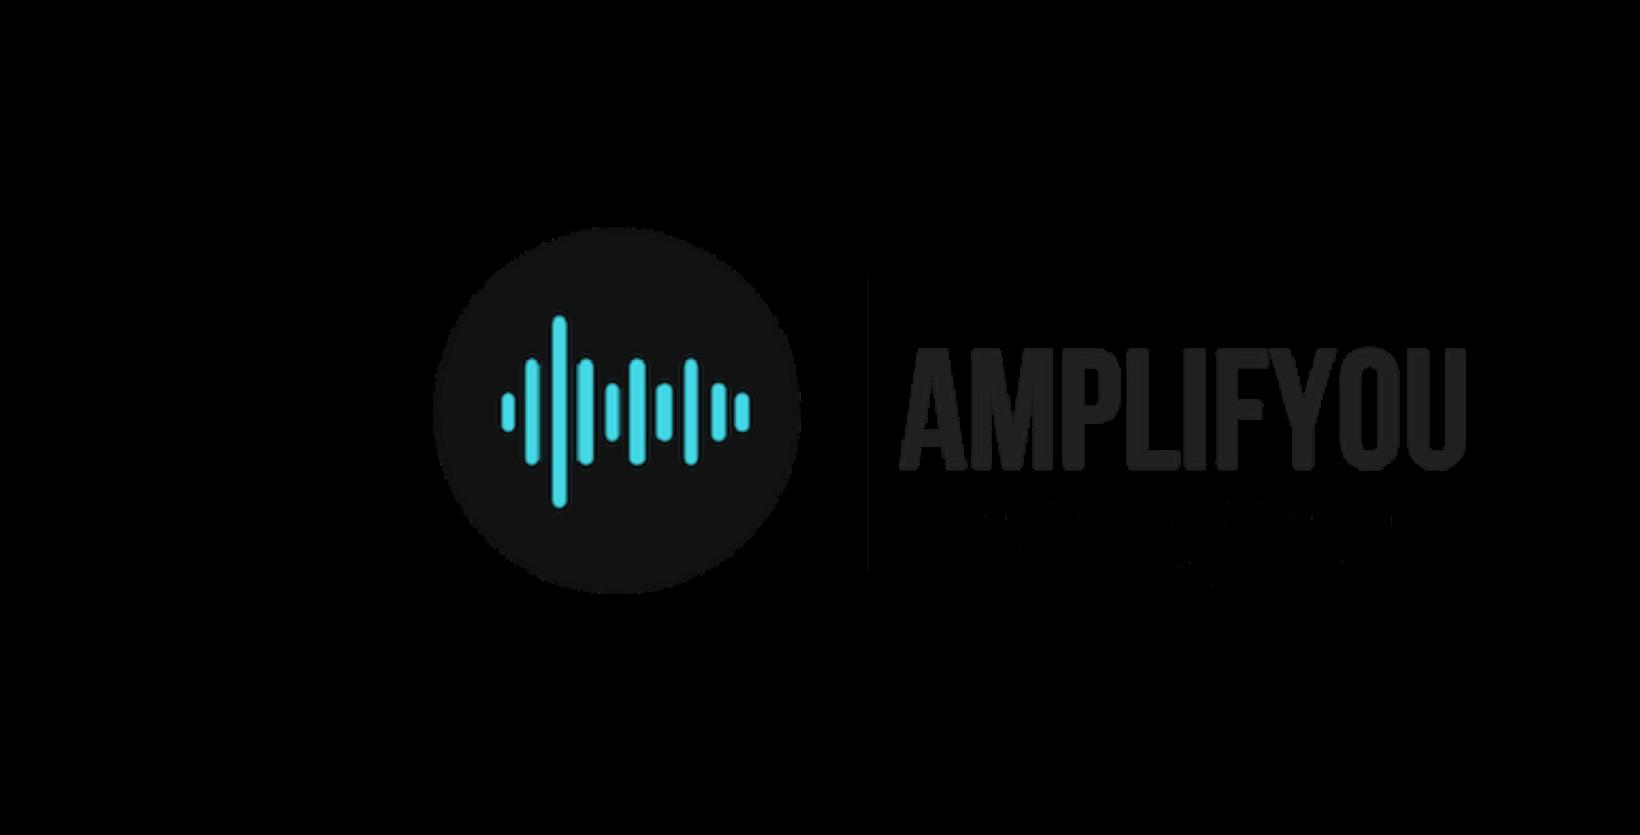 Amplifyou